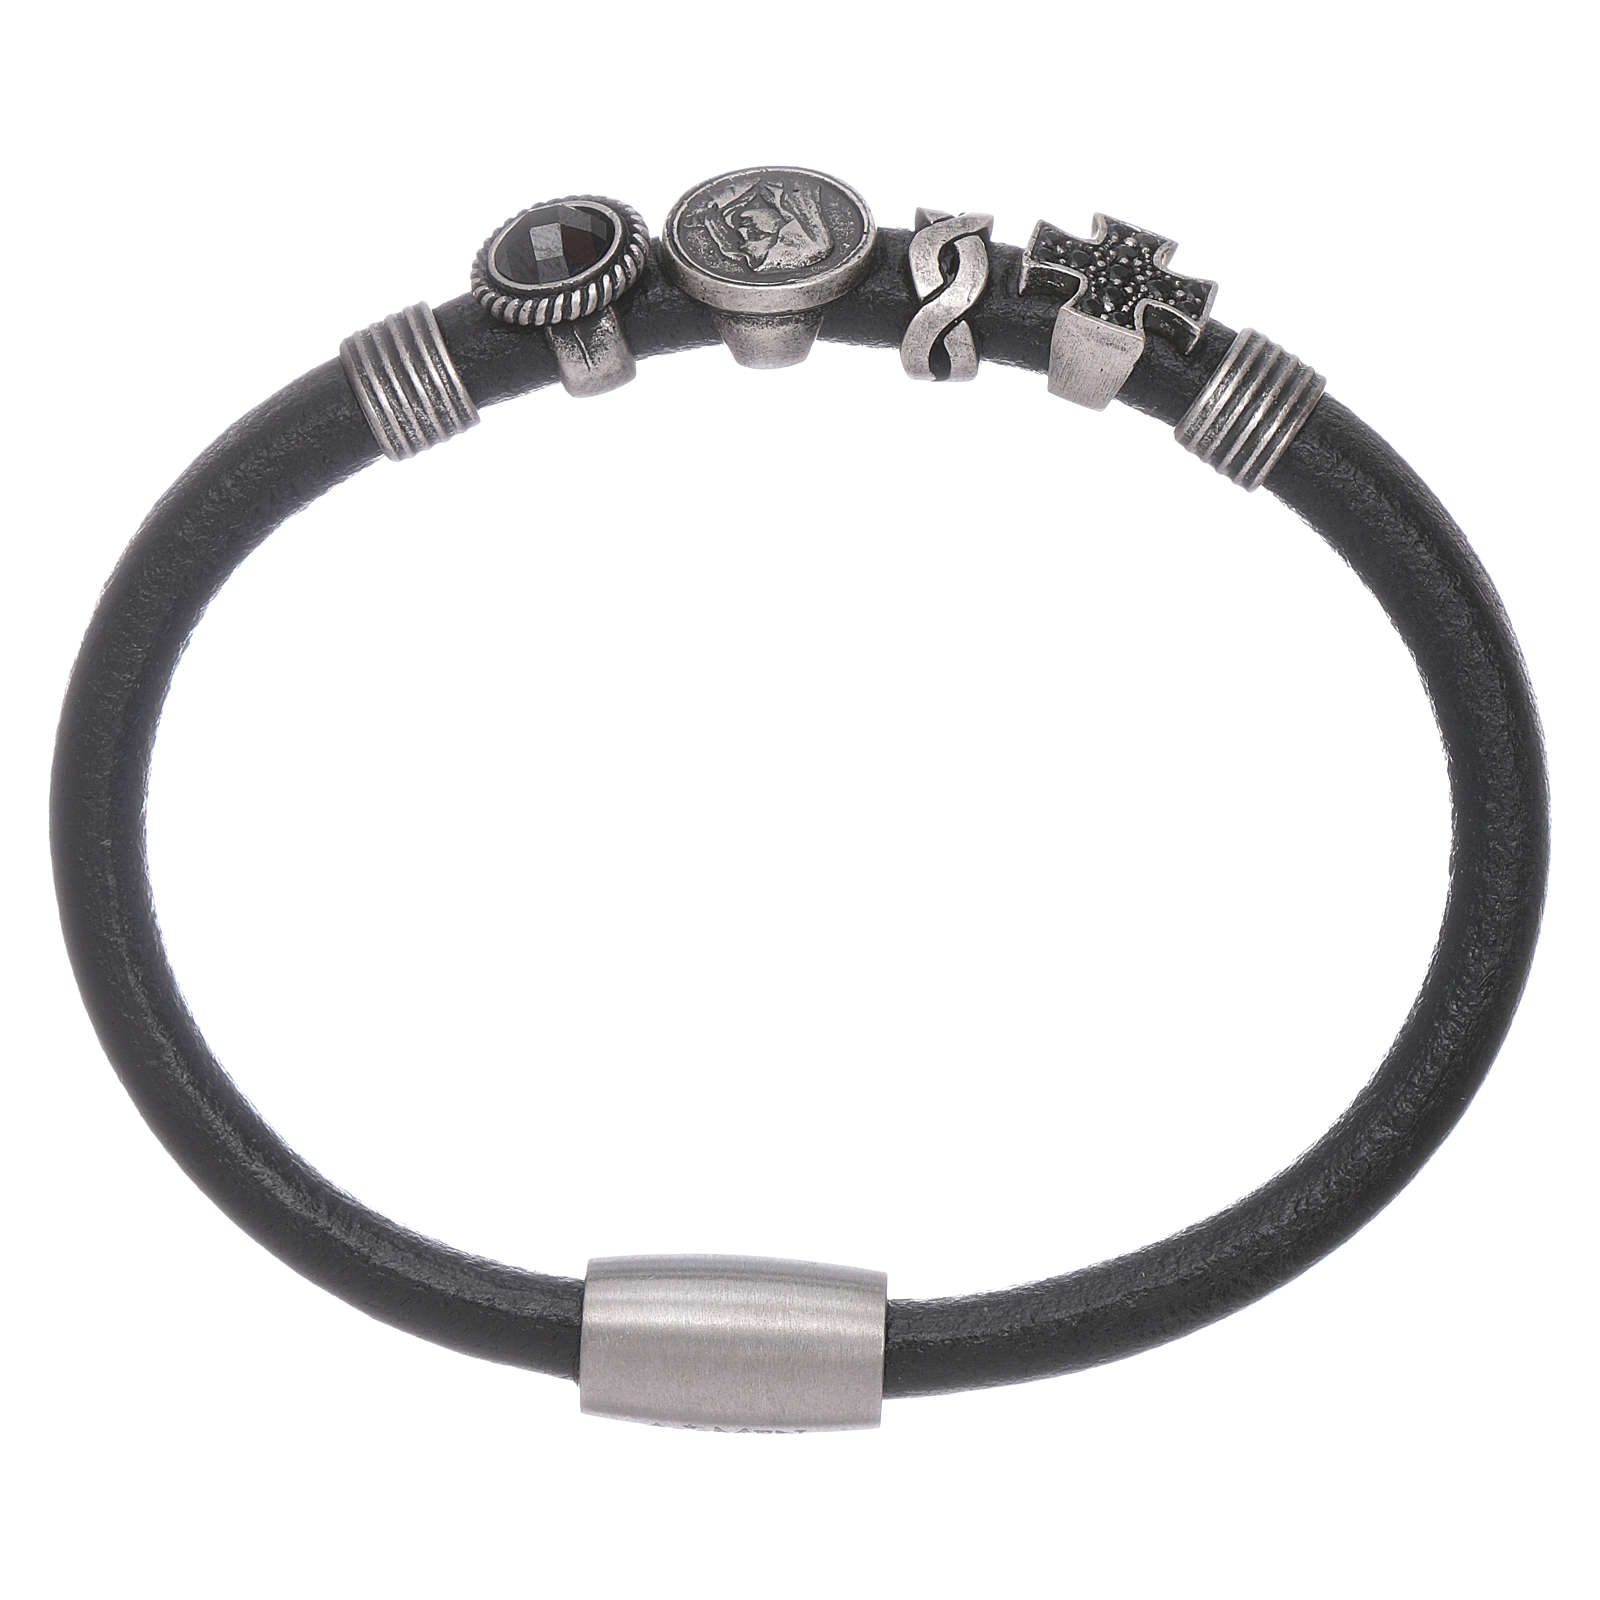 AMEN black leather bracelet with black zircon charms 4